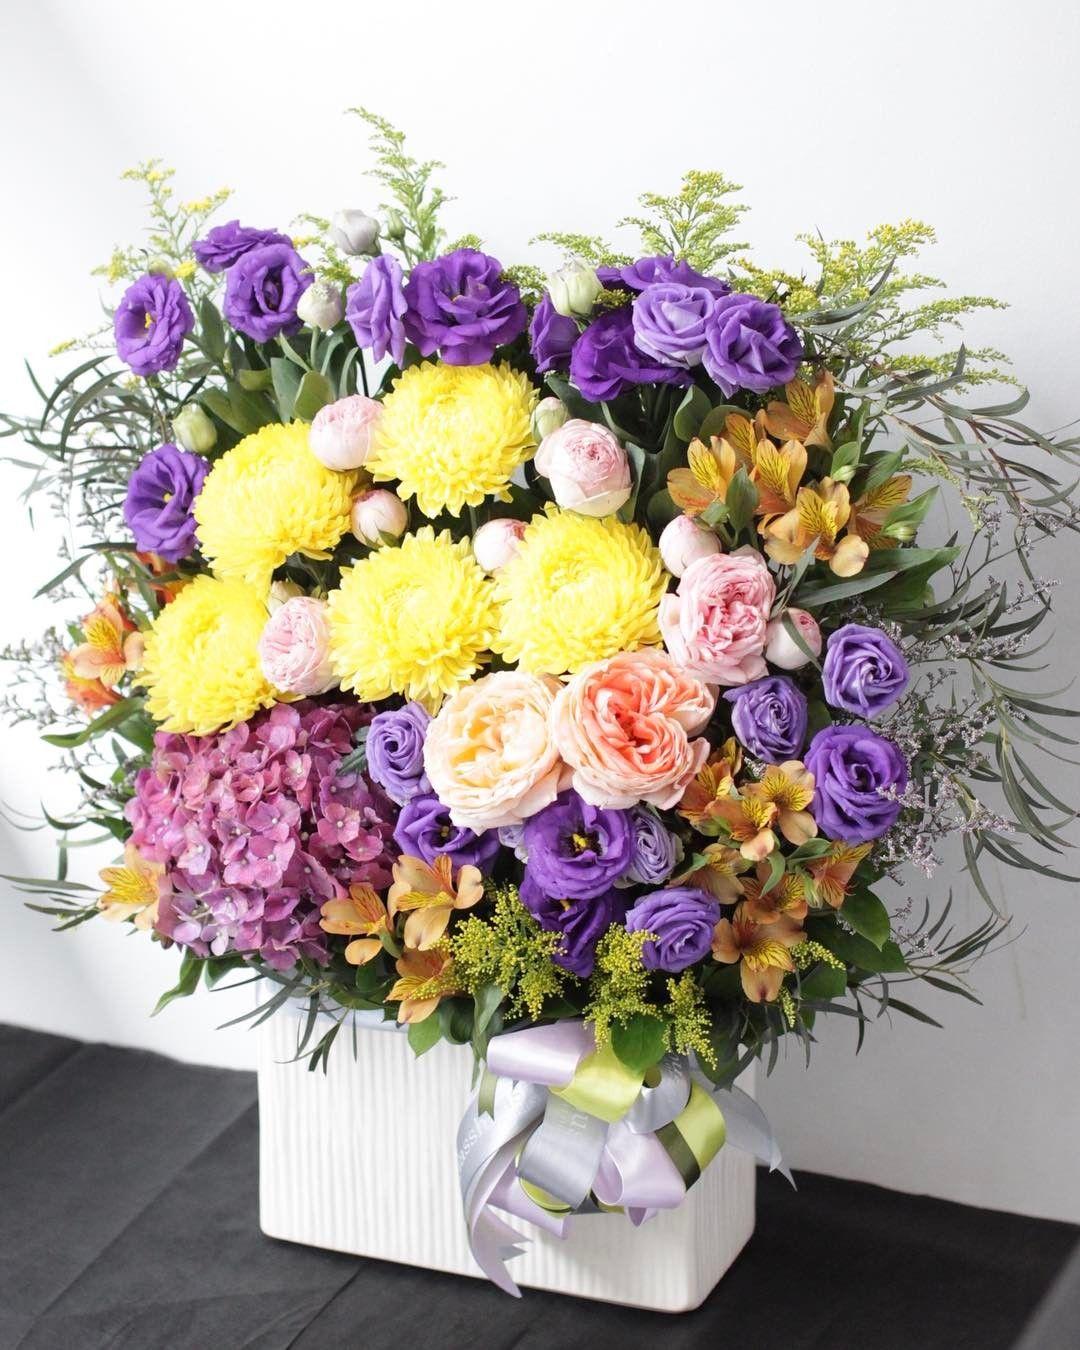 40 Likes, 1 Comments Jakarta Professional Florist